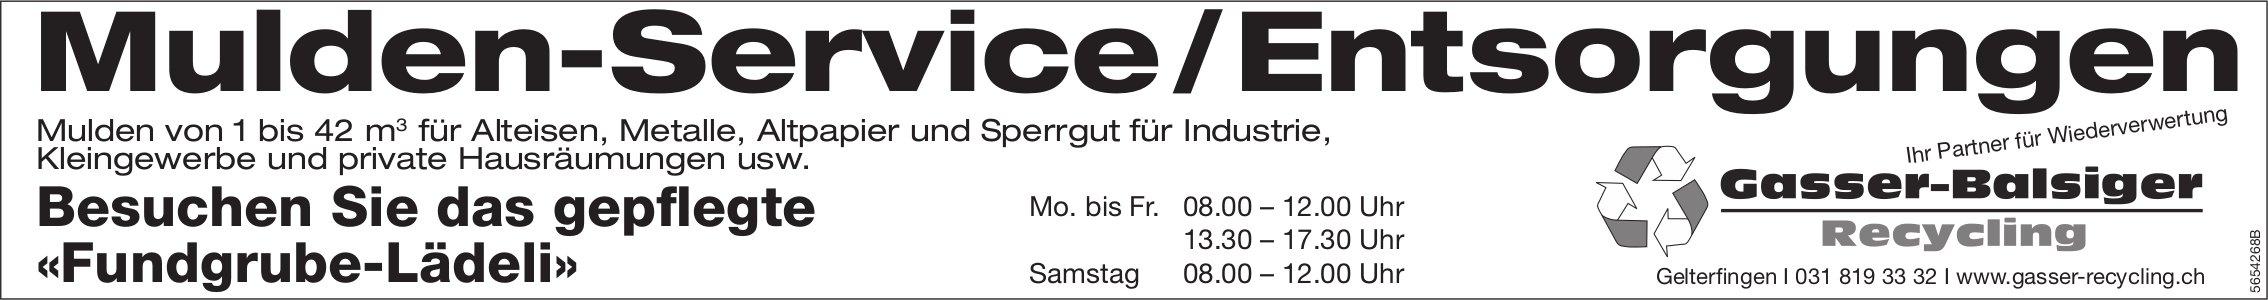 Gasser-Balsiger Recycling, Gelterfingen - Mulden-Service / Entsorgungen